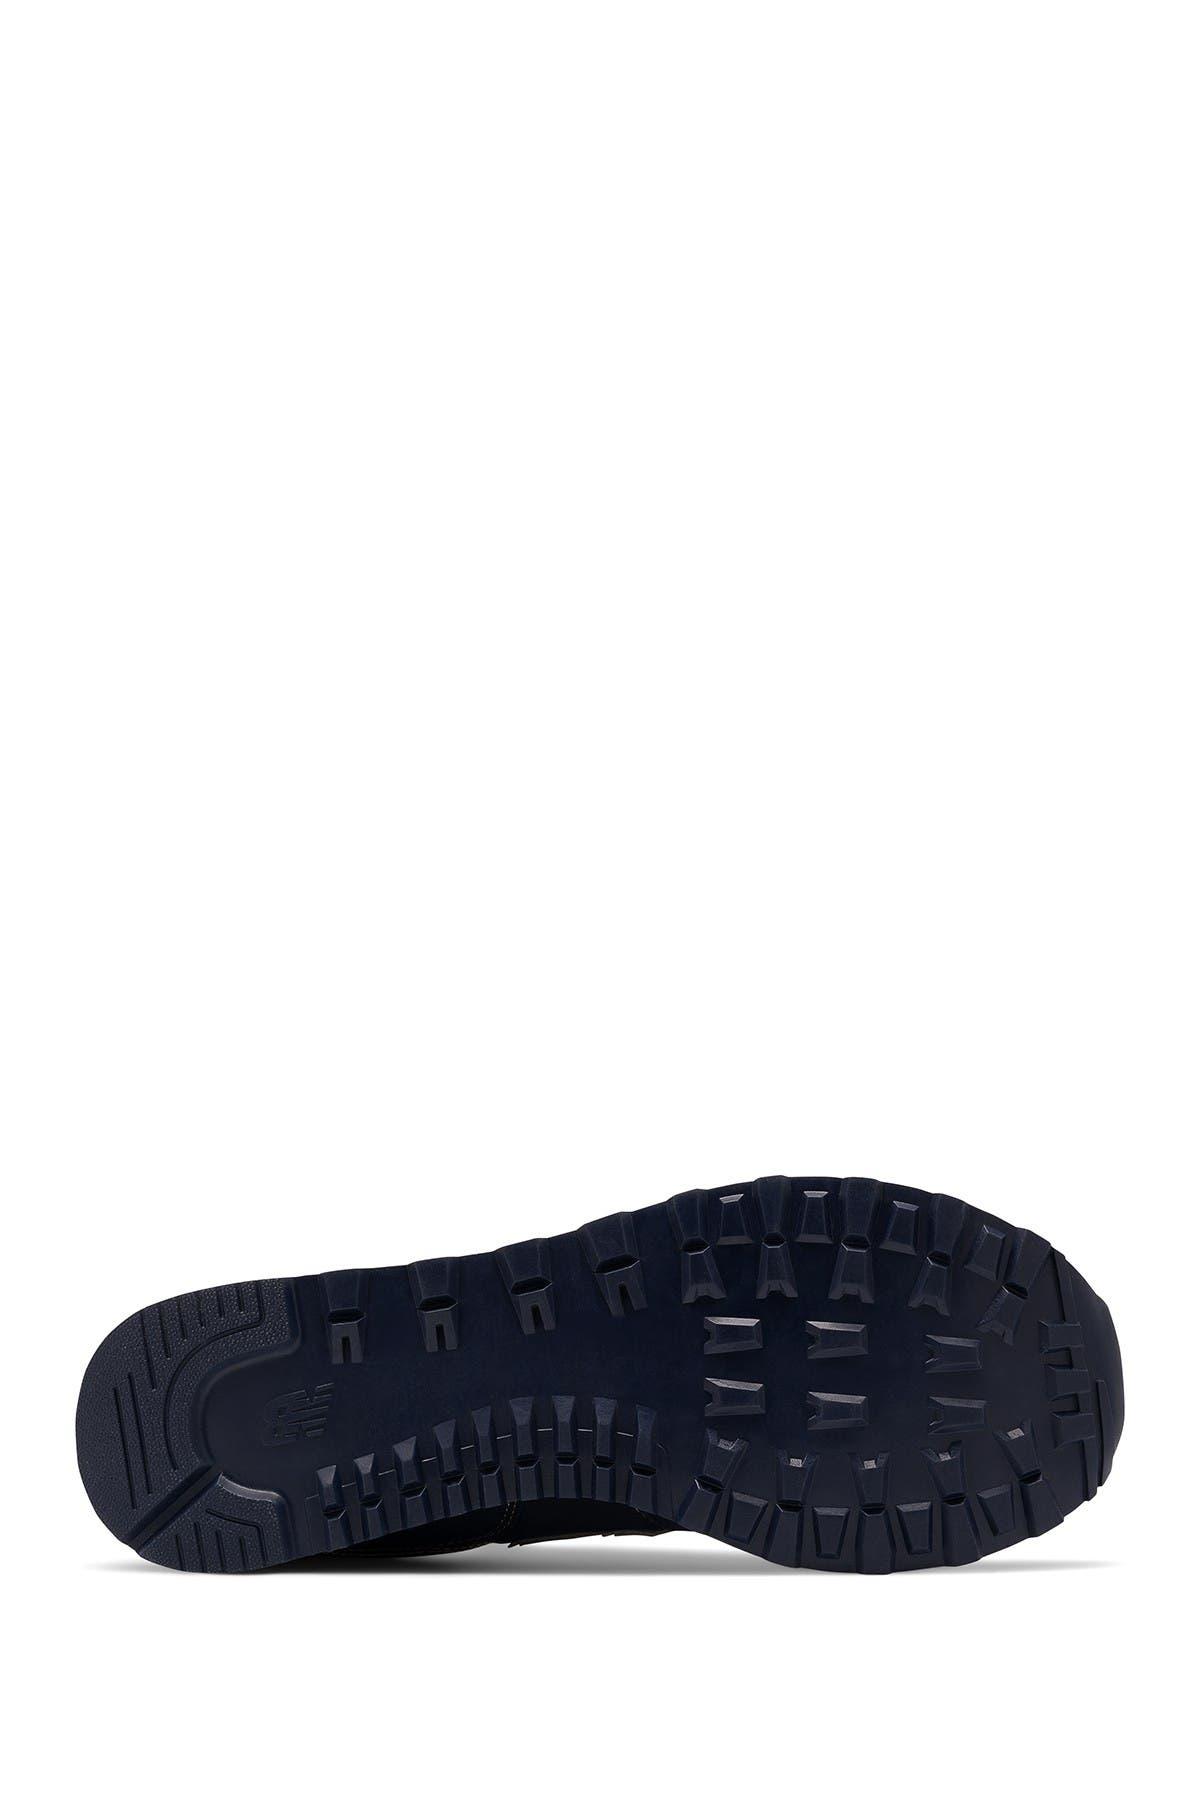 Image of New Balance 574 Classic Running Shoe